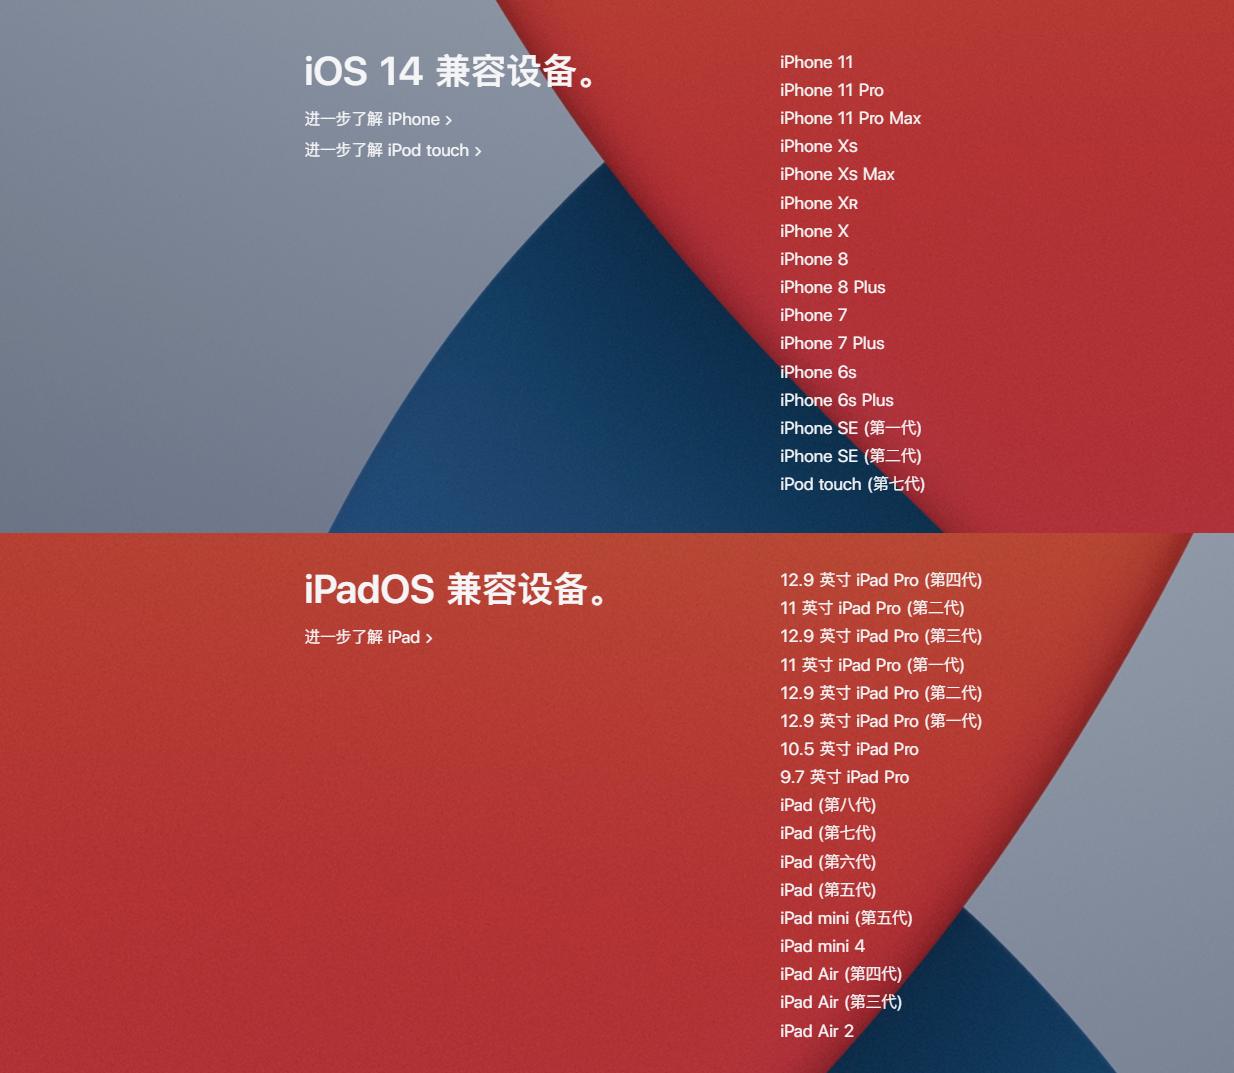 iOS 14正式版来了,可升级型号很全,但我不建议现在升级!